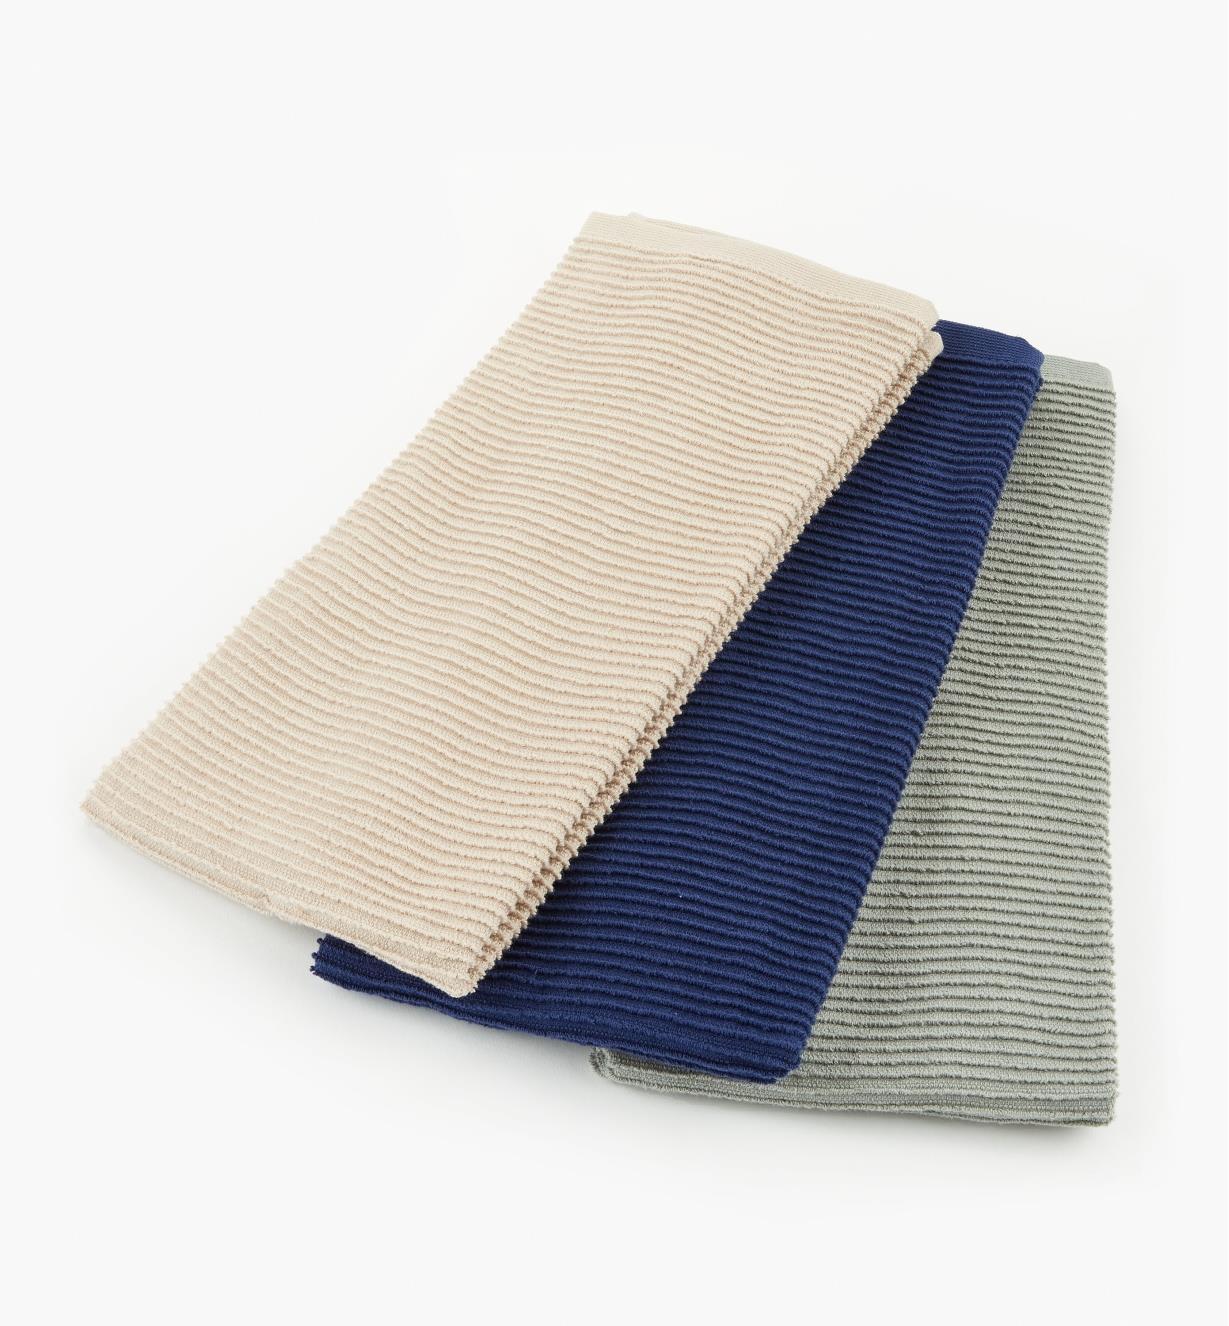 88K5858 - Set of 3 Ripple Towels (blue, gray, beige)